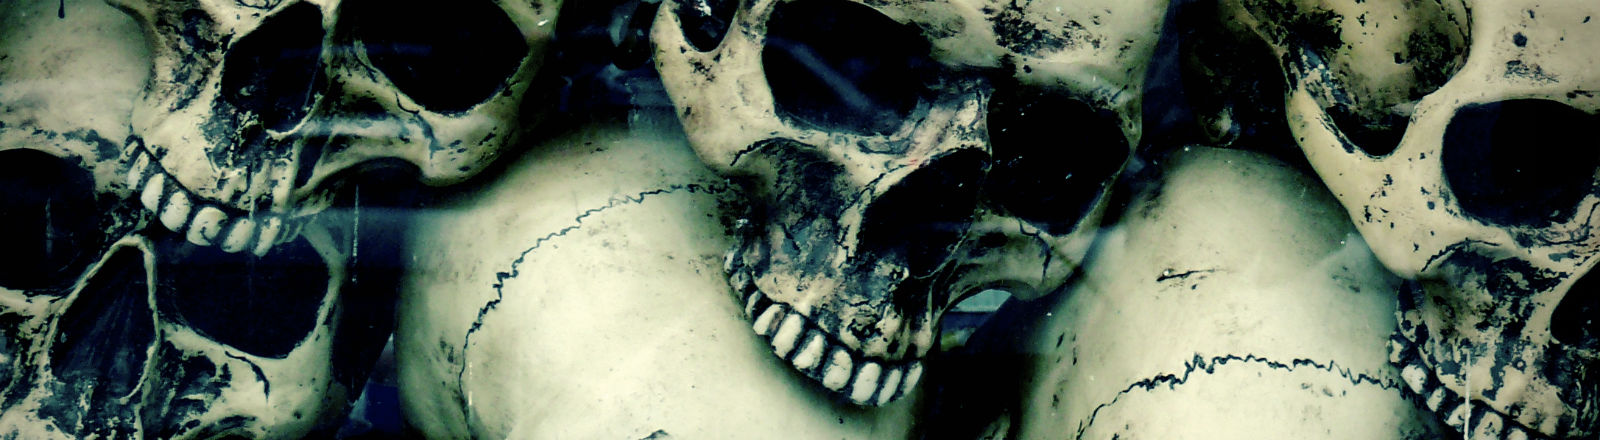 Mehrere alte Schädel